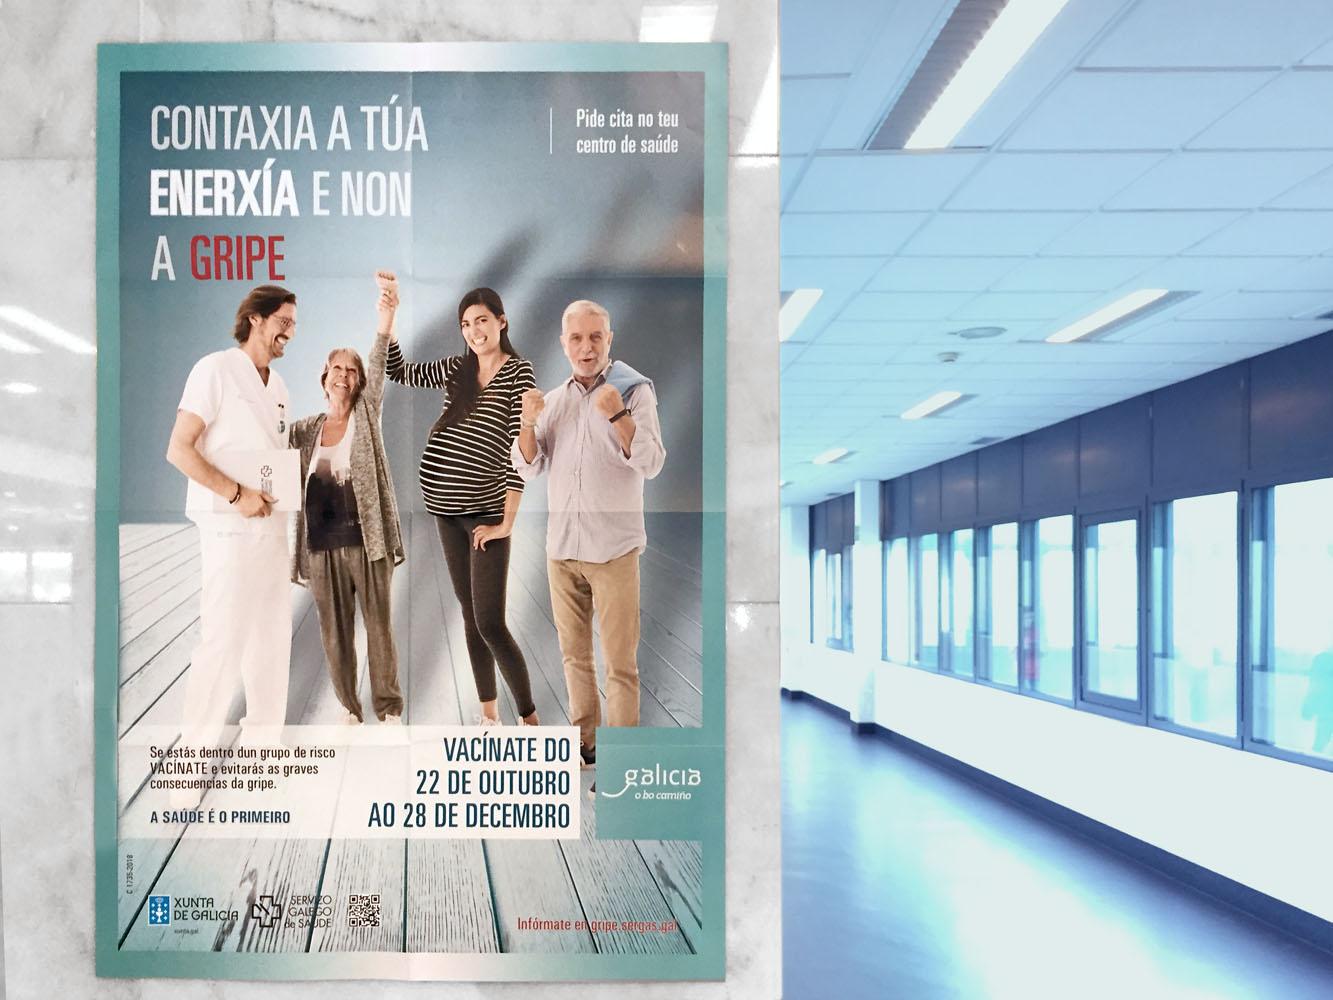 ramon-vaquero-fotografos-vigo_publicidad_segas_xunta_gripe_2